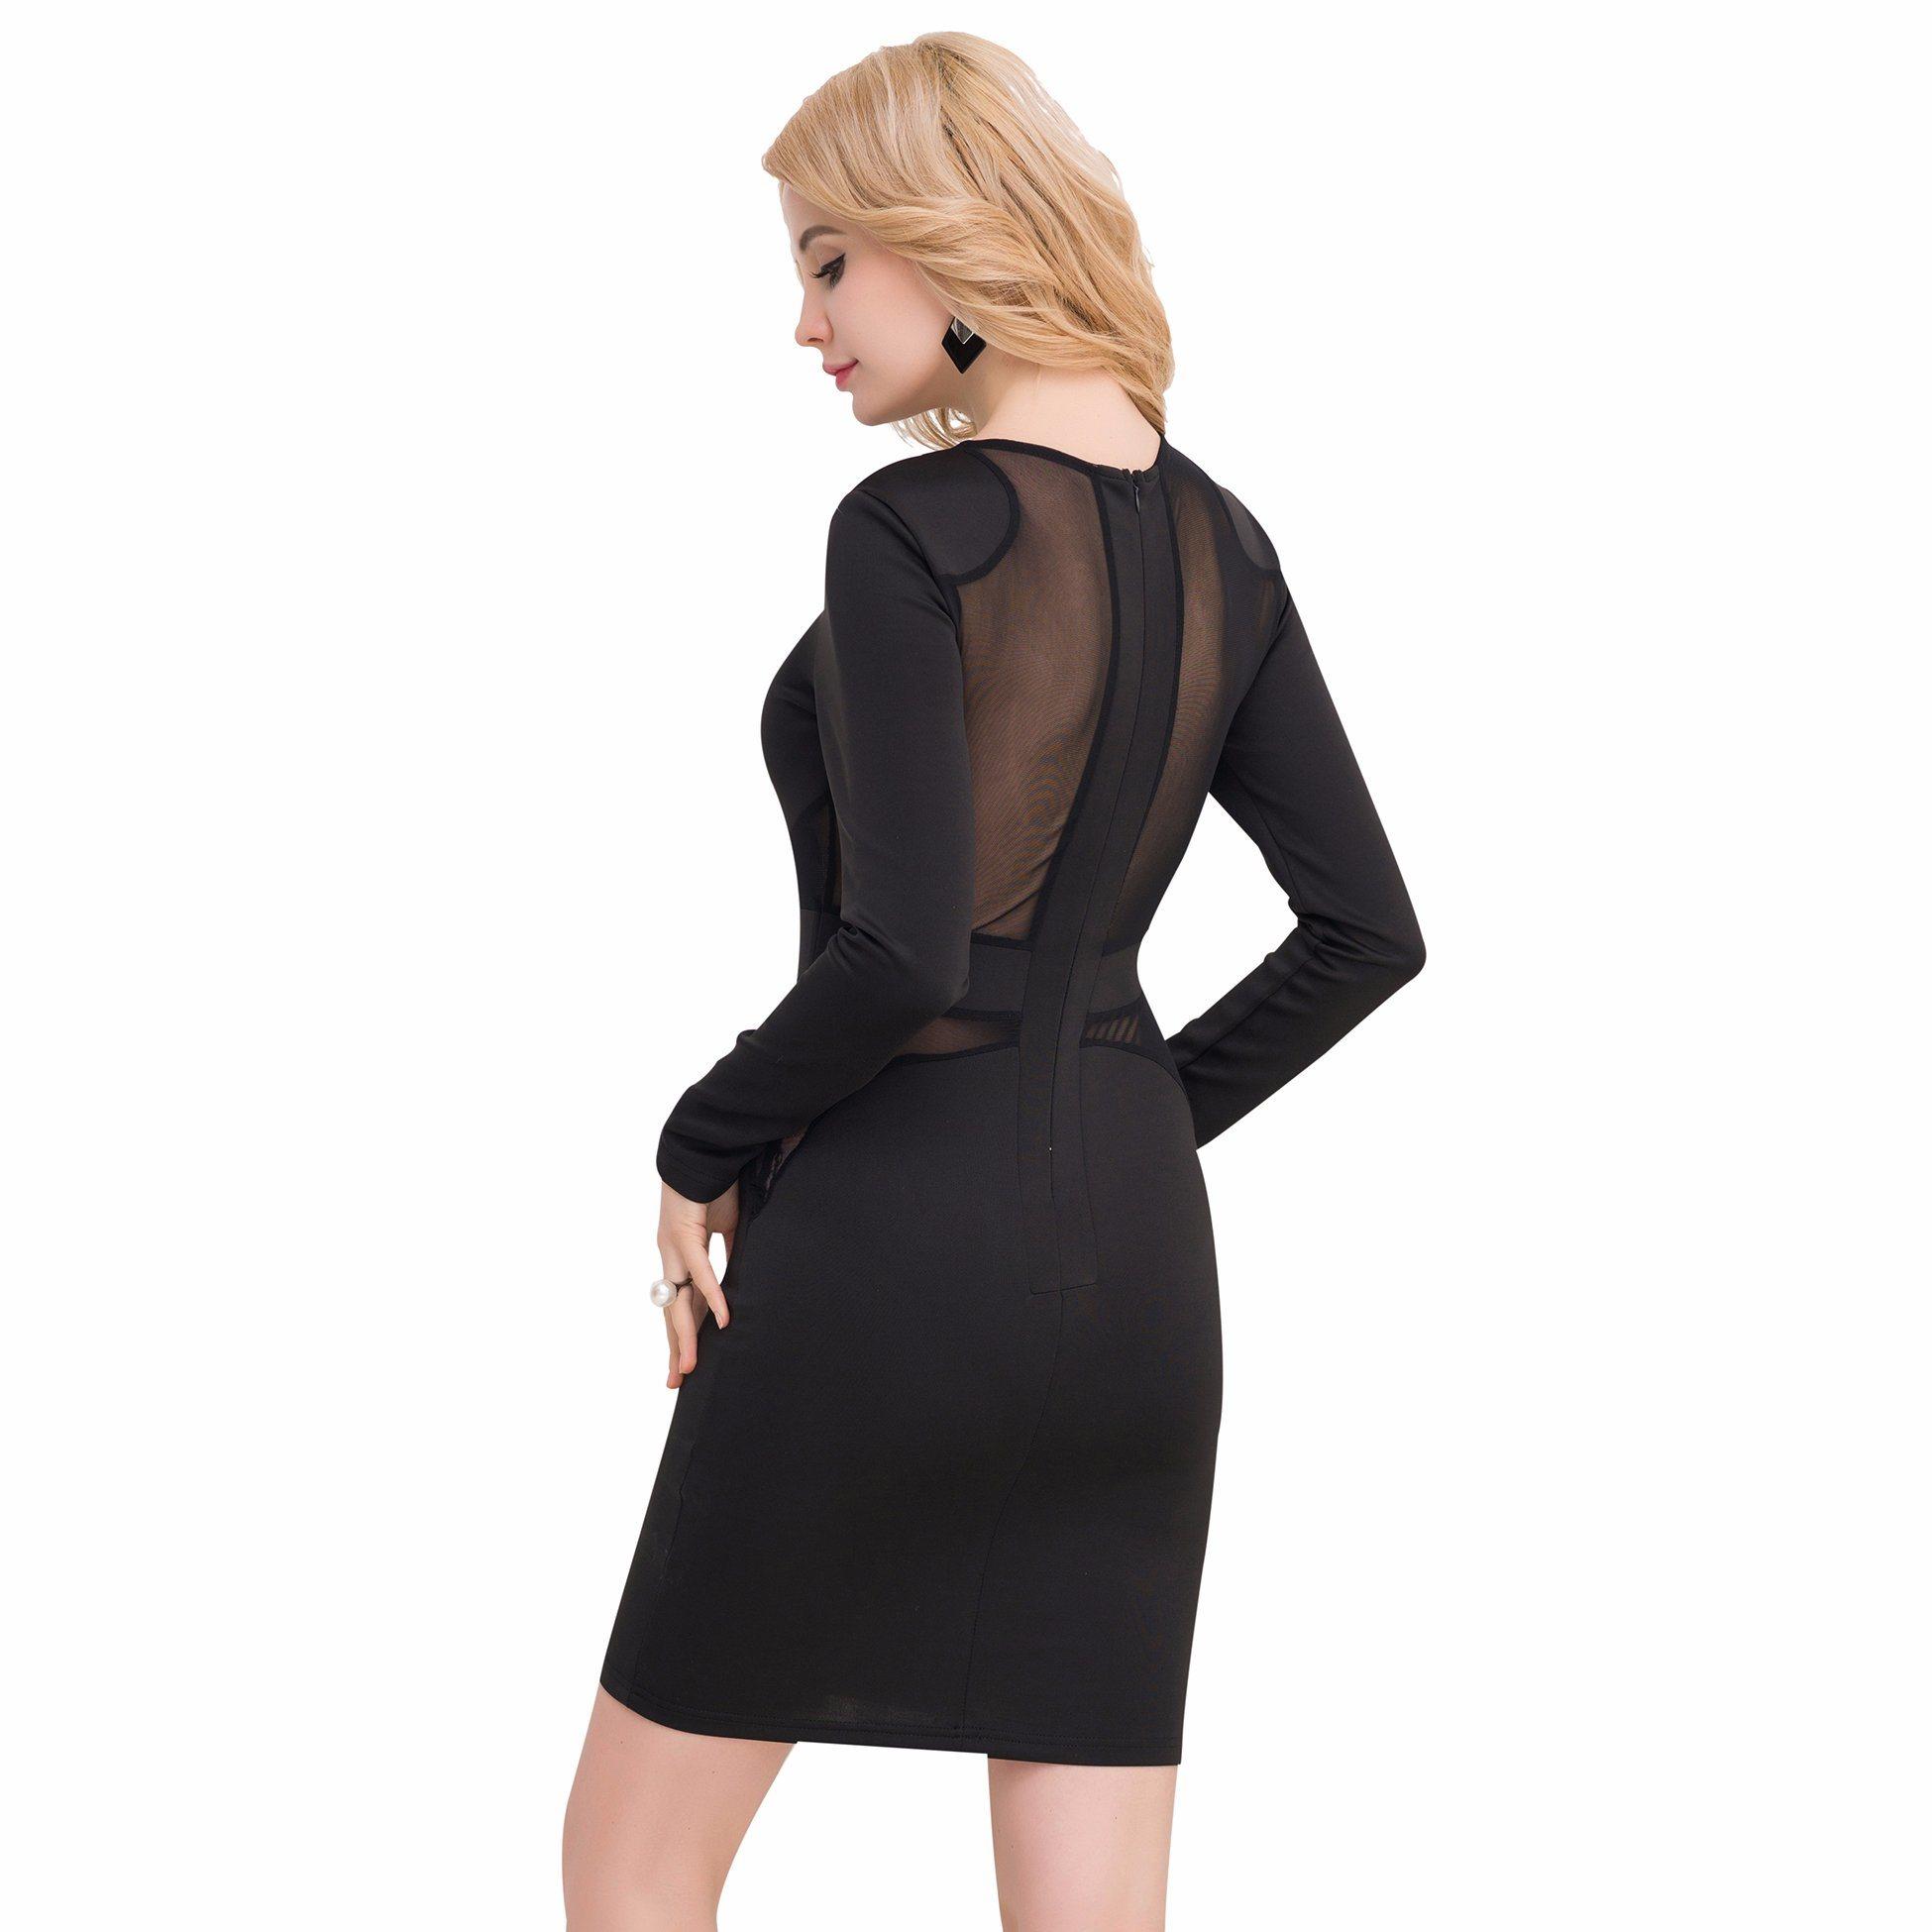 Hot Selling Elegant Black Bodcon Dress